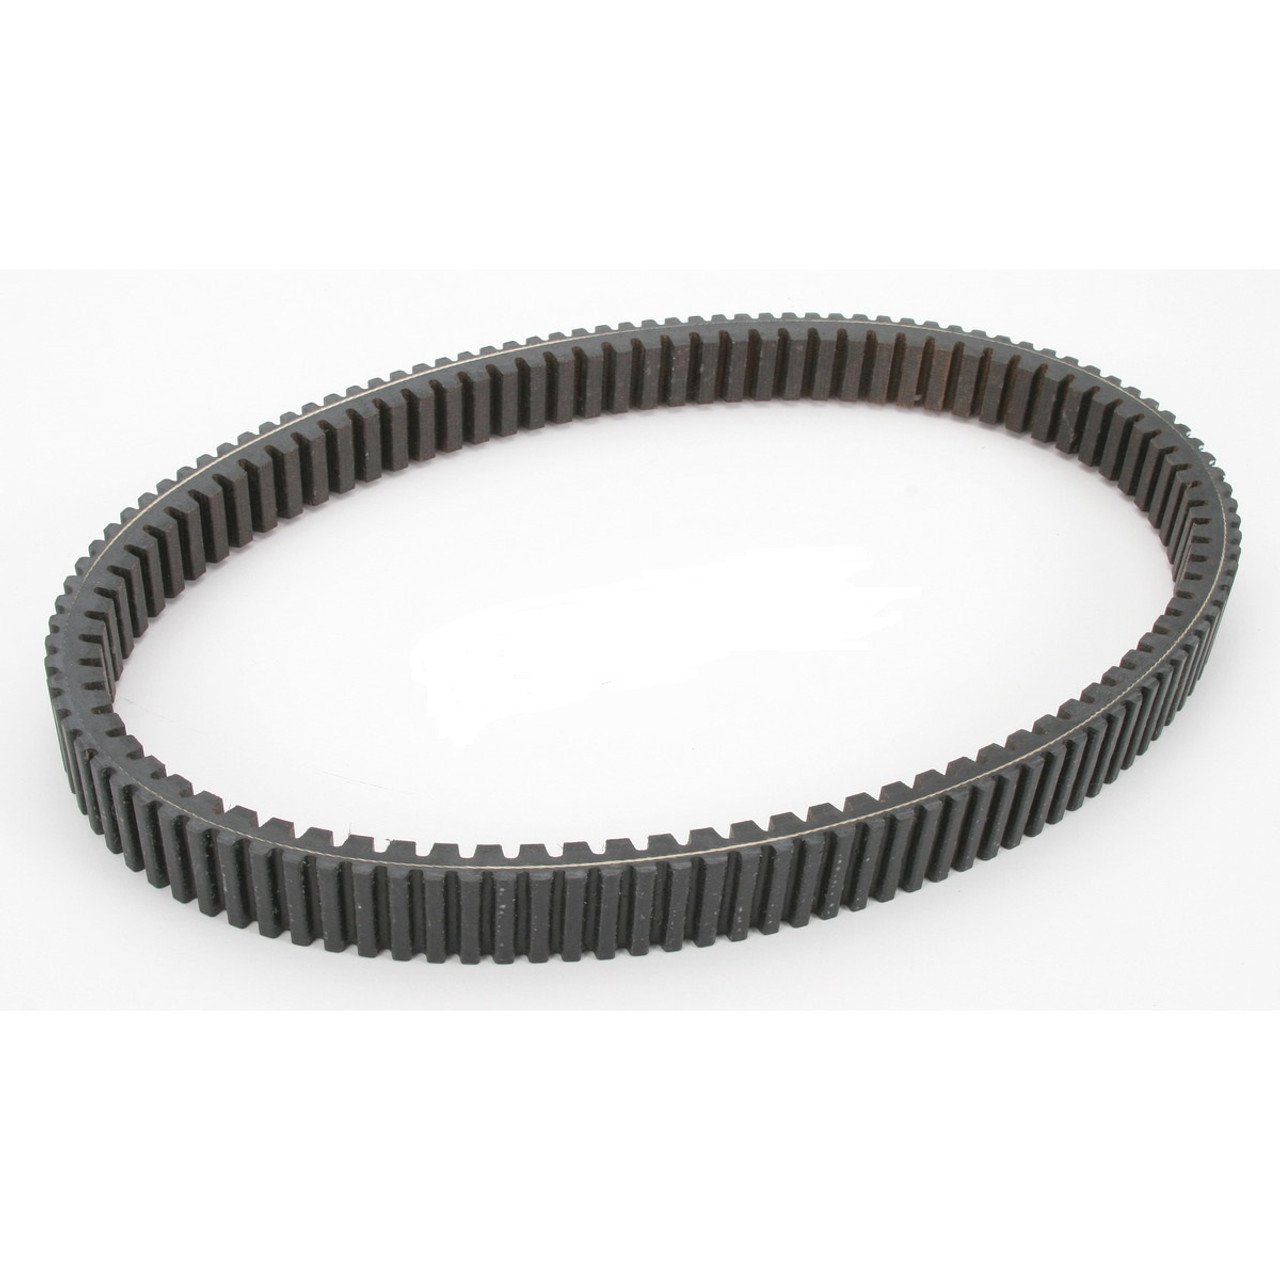 medium resolution of cfmoto performance atv utv 500cc 400 600 625 drive belt replaces cf188 055000 whygostock com